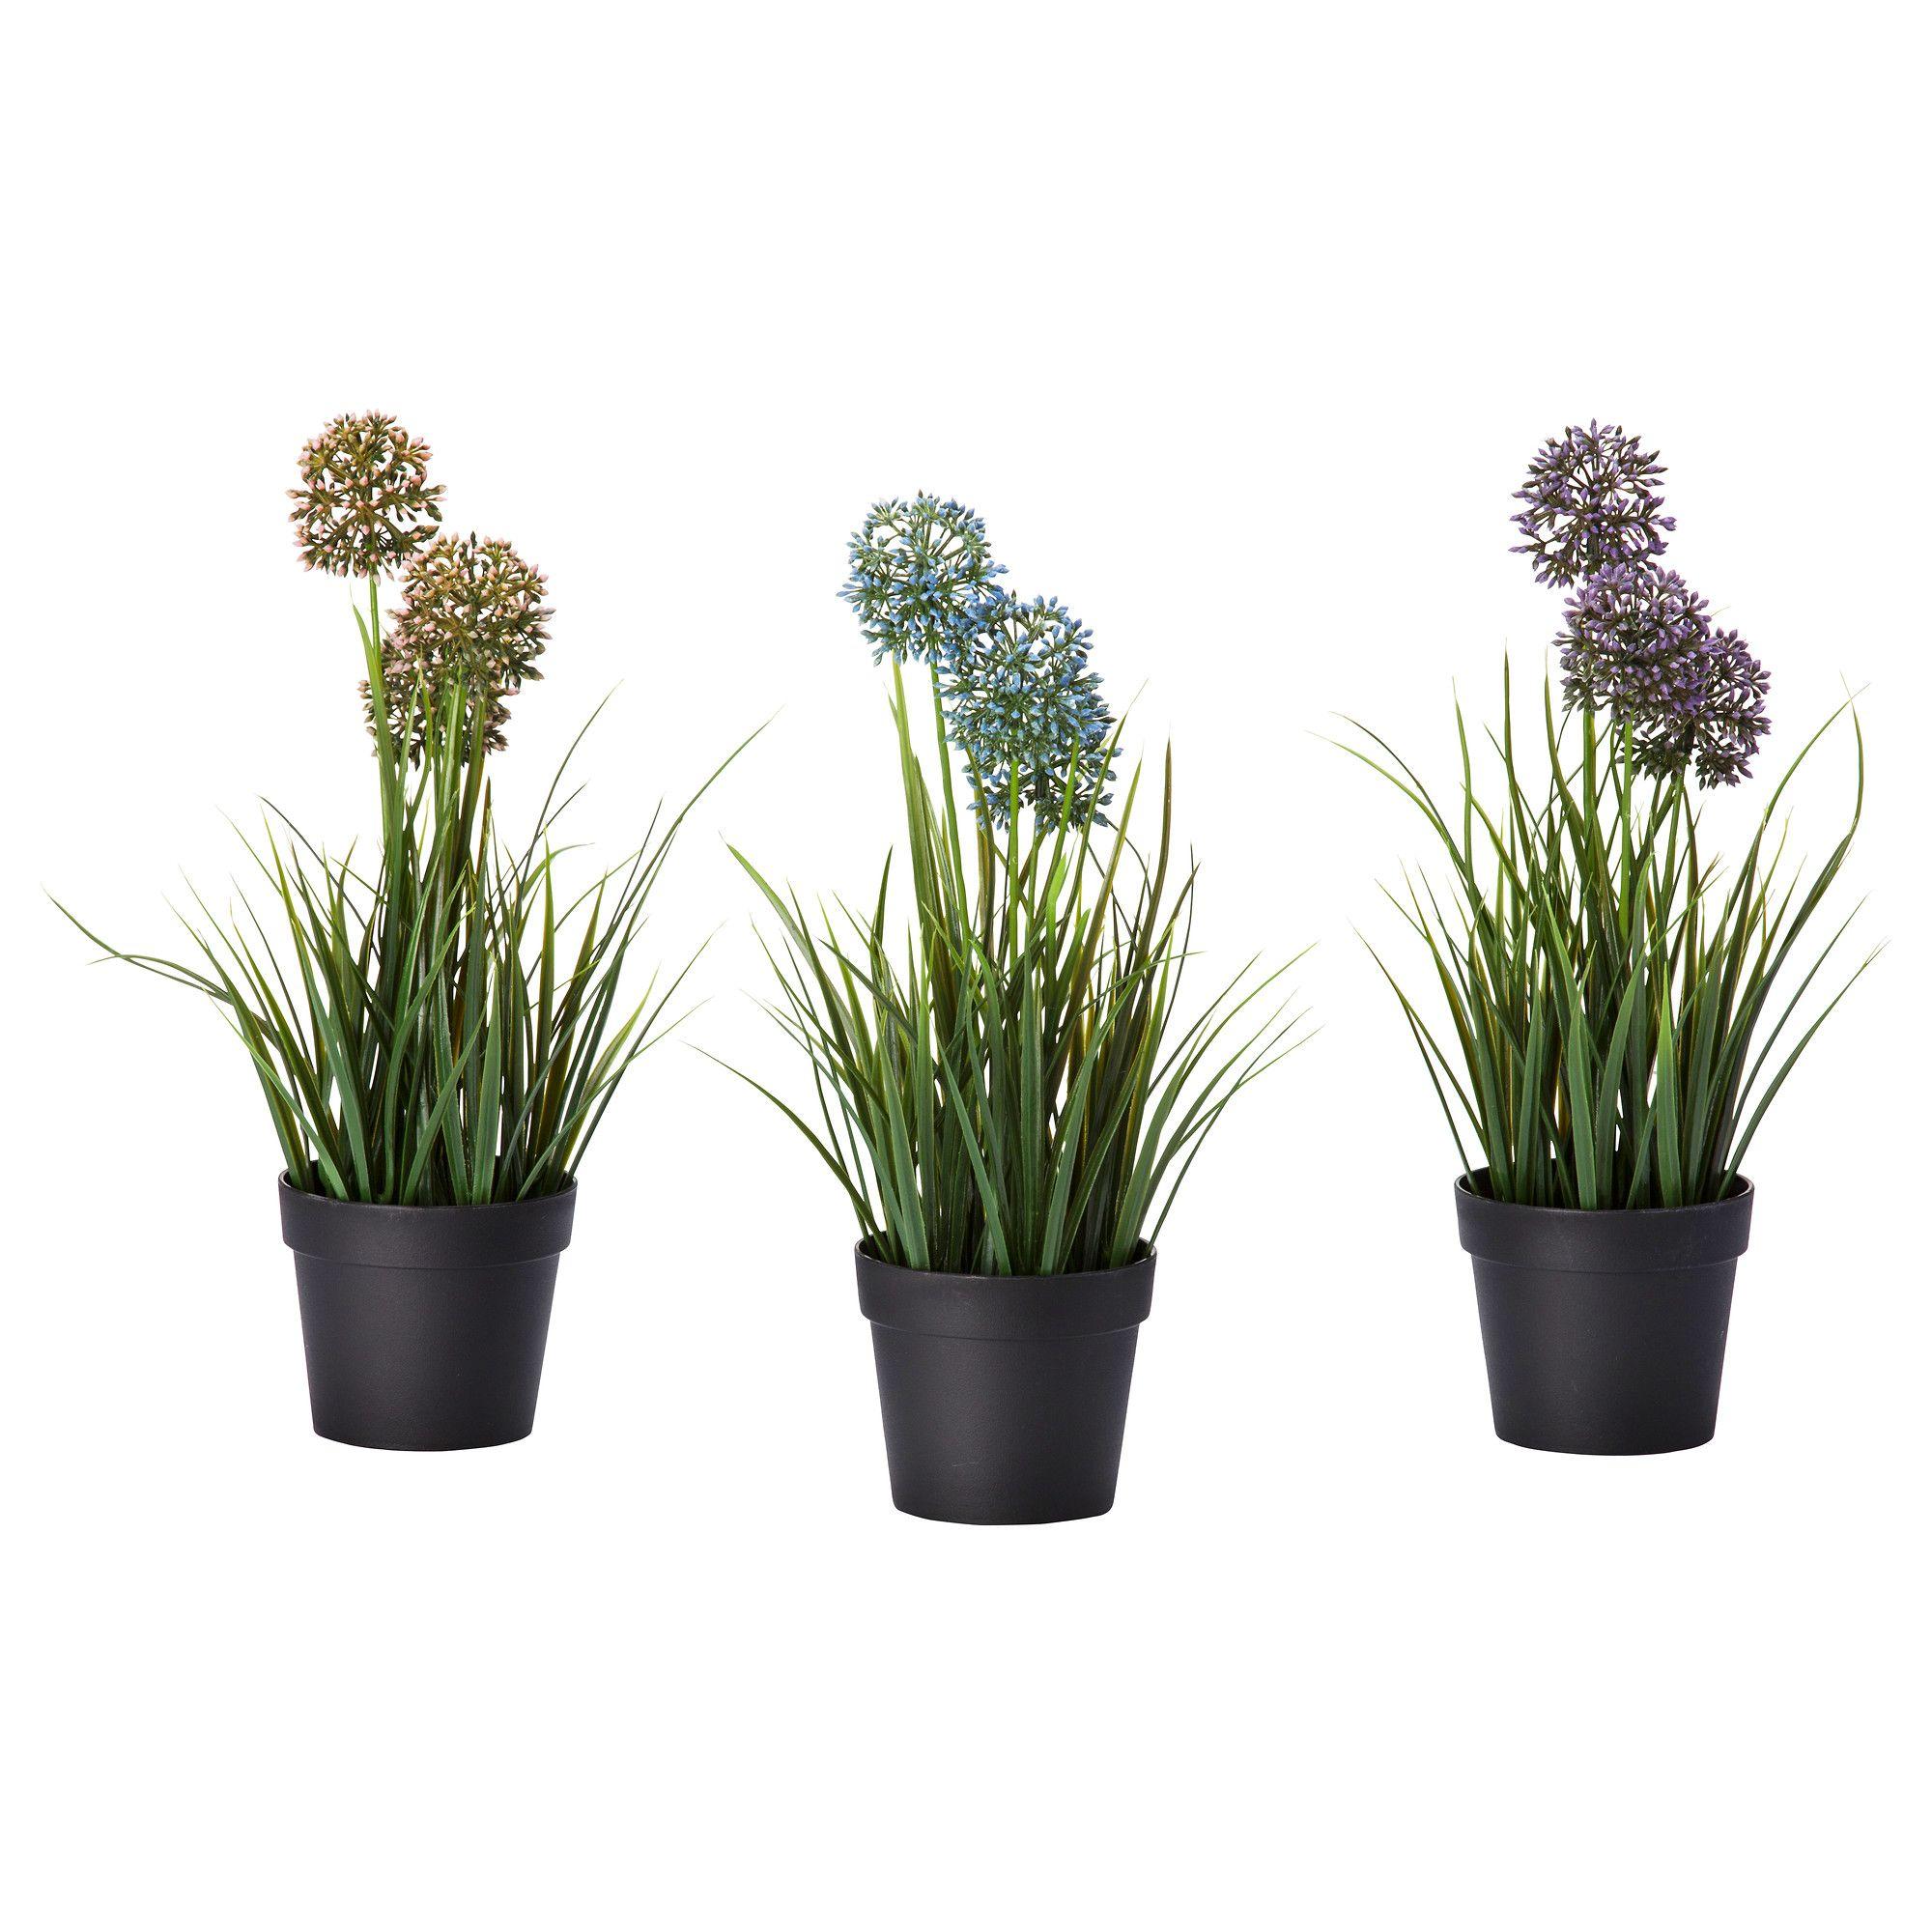 FEJKA Artificial potted plant - IKEA | Natural living room ...